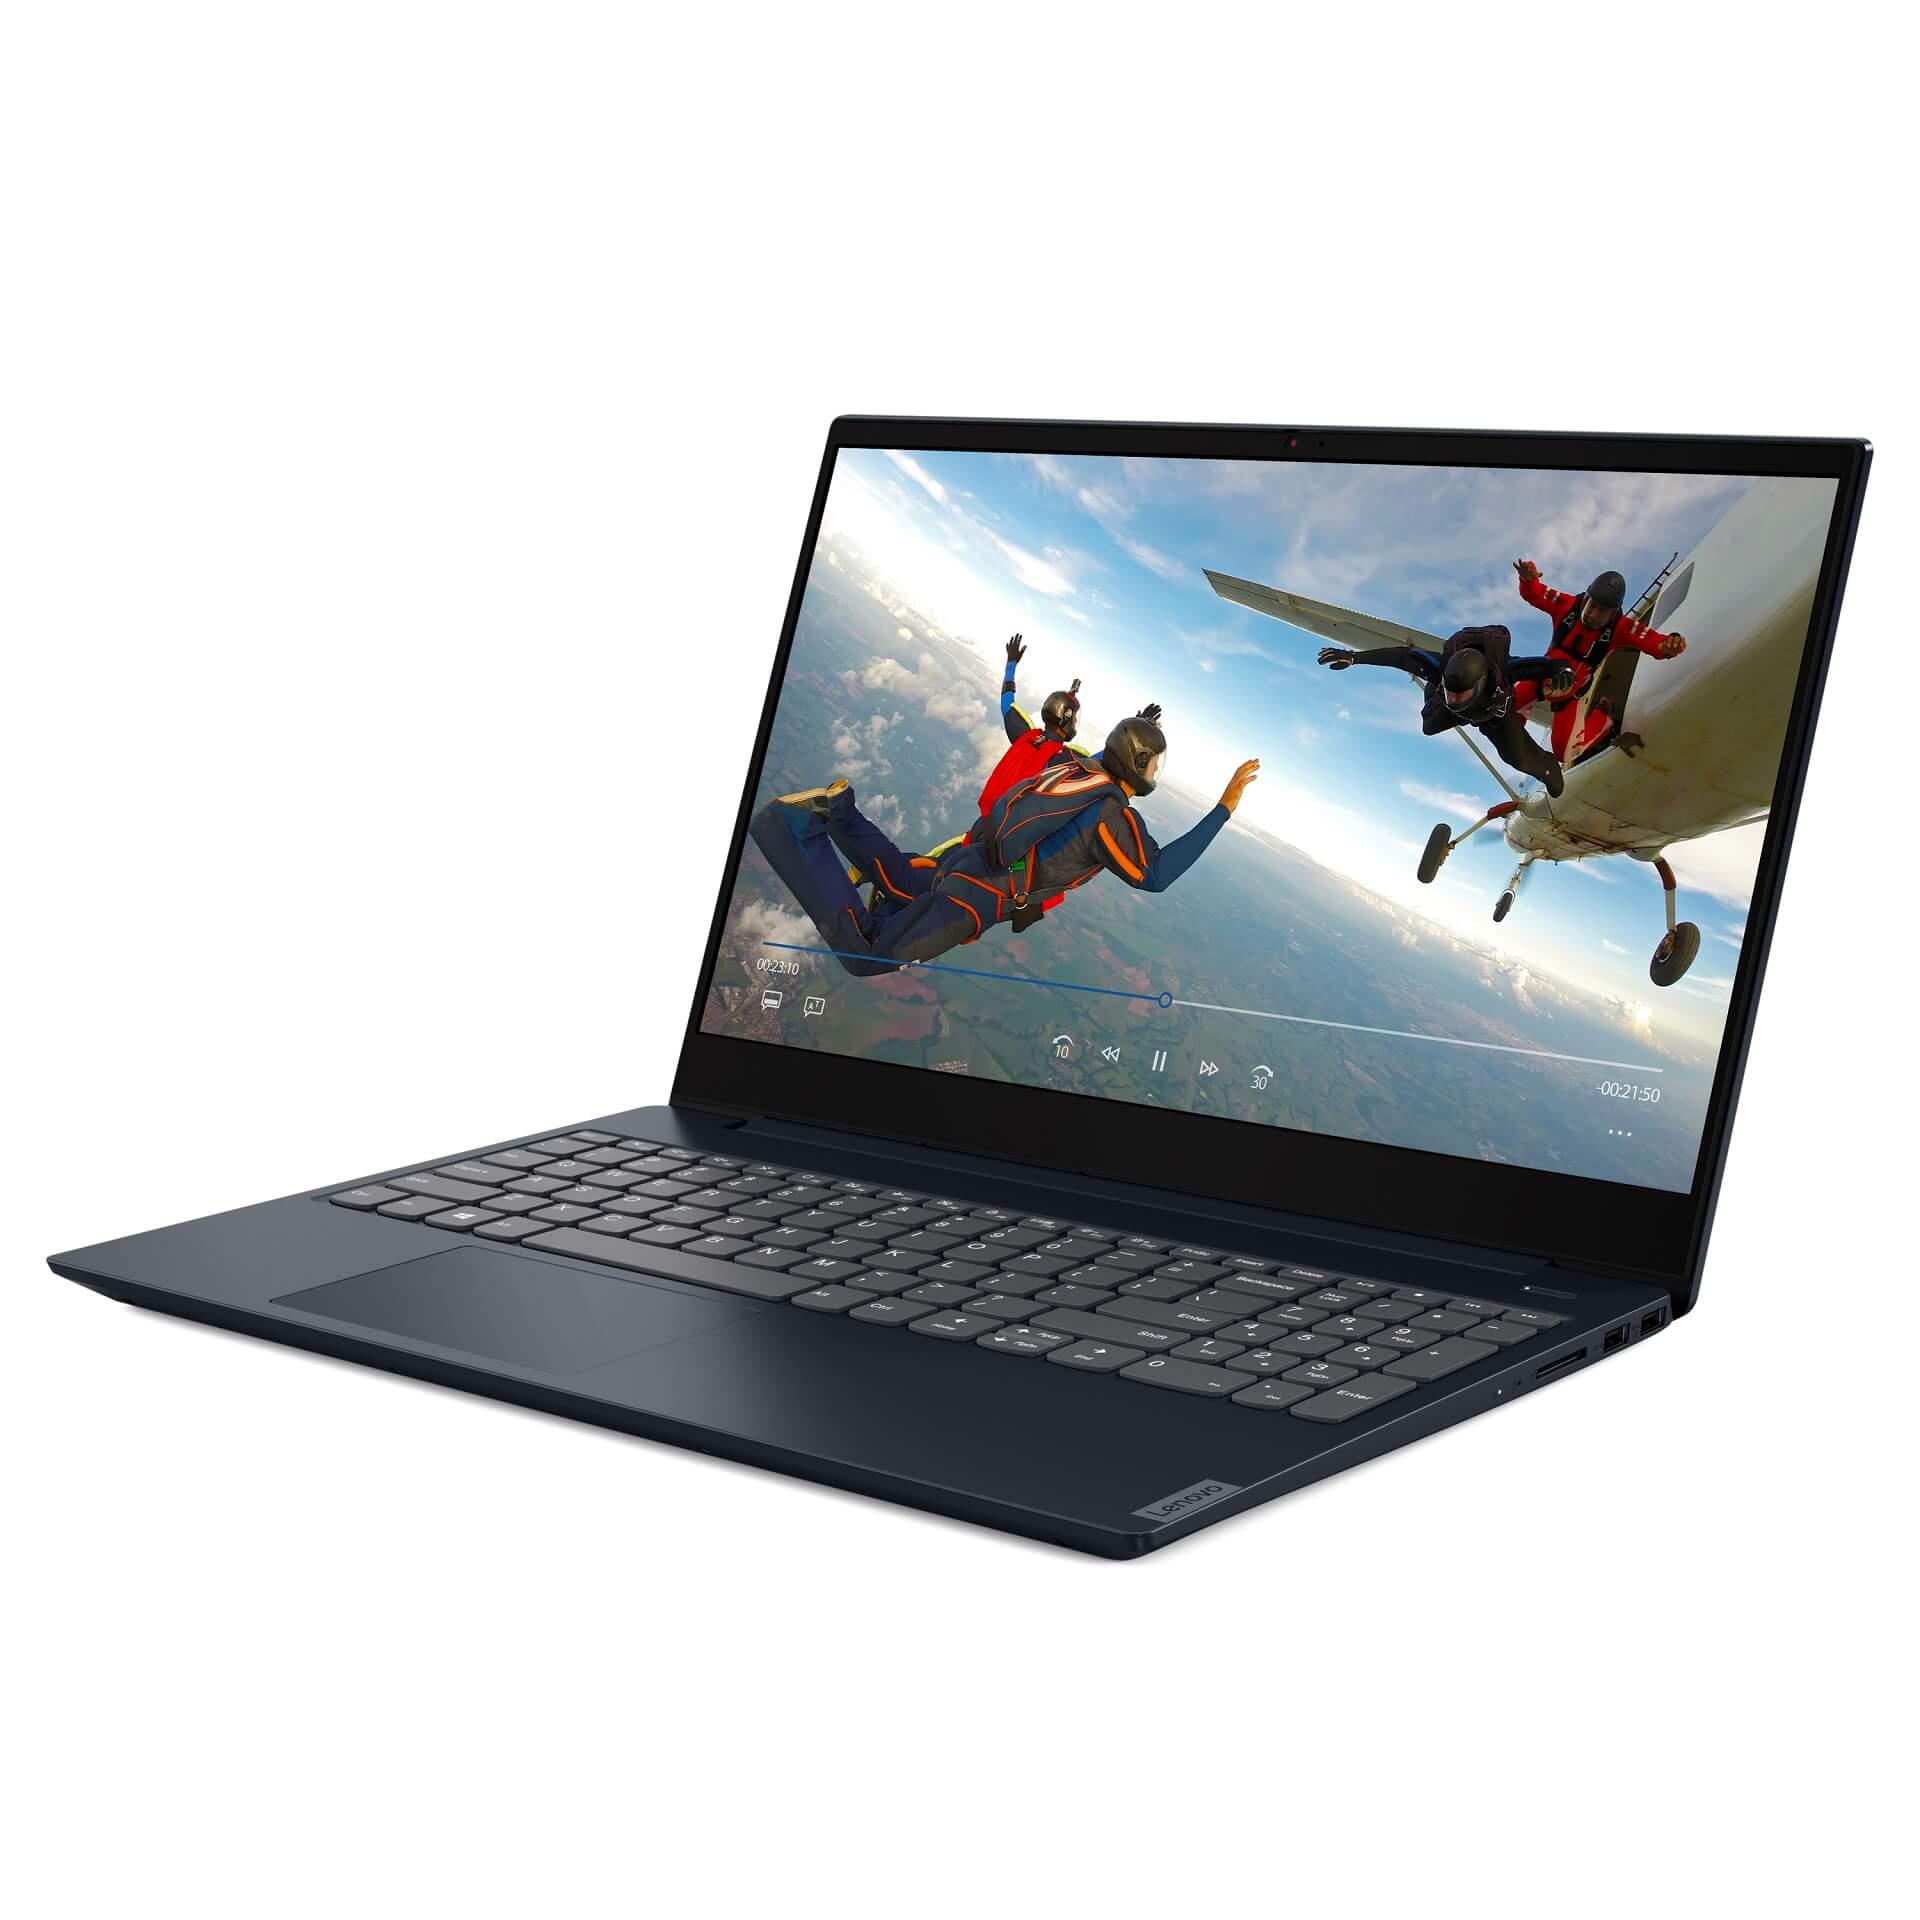 Lenovo IdeaPad S340 15IWL Core i5 8265U 8GB 128GB 15.6 inch HD Windows 10